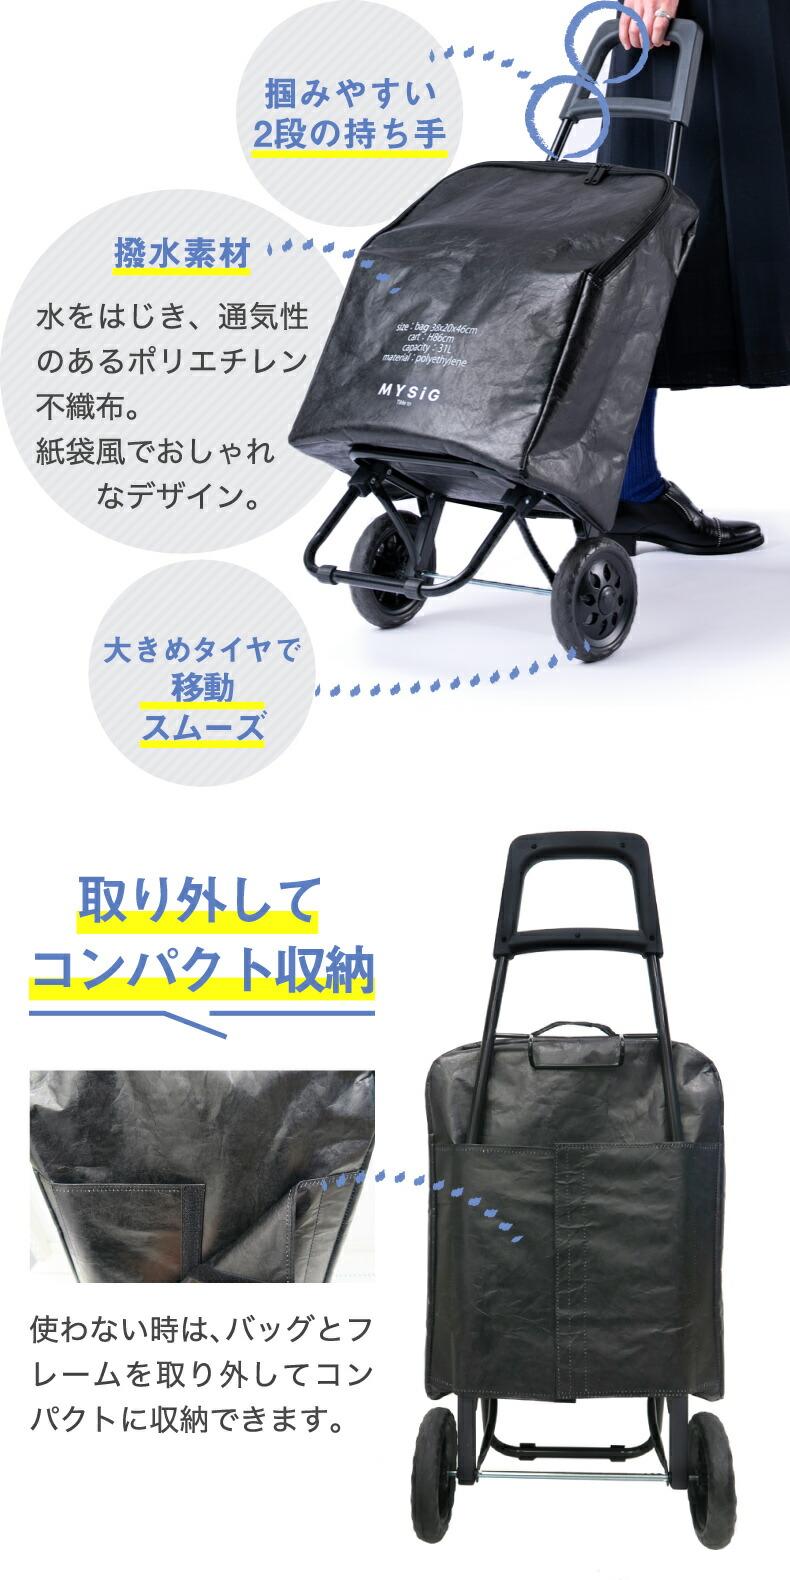 MYSiG Classix ショッピングキャリー  31L 買い物 バッグ ショッピングカート キャリーカート